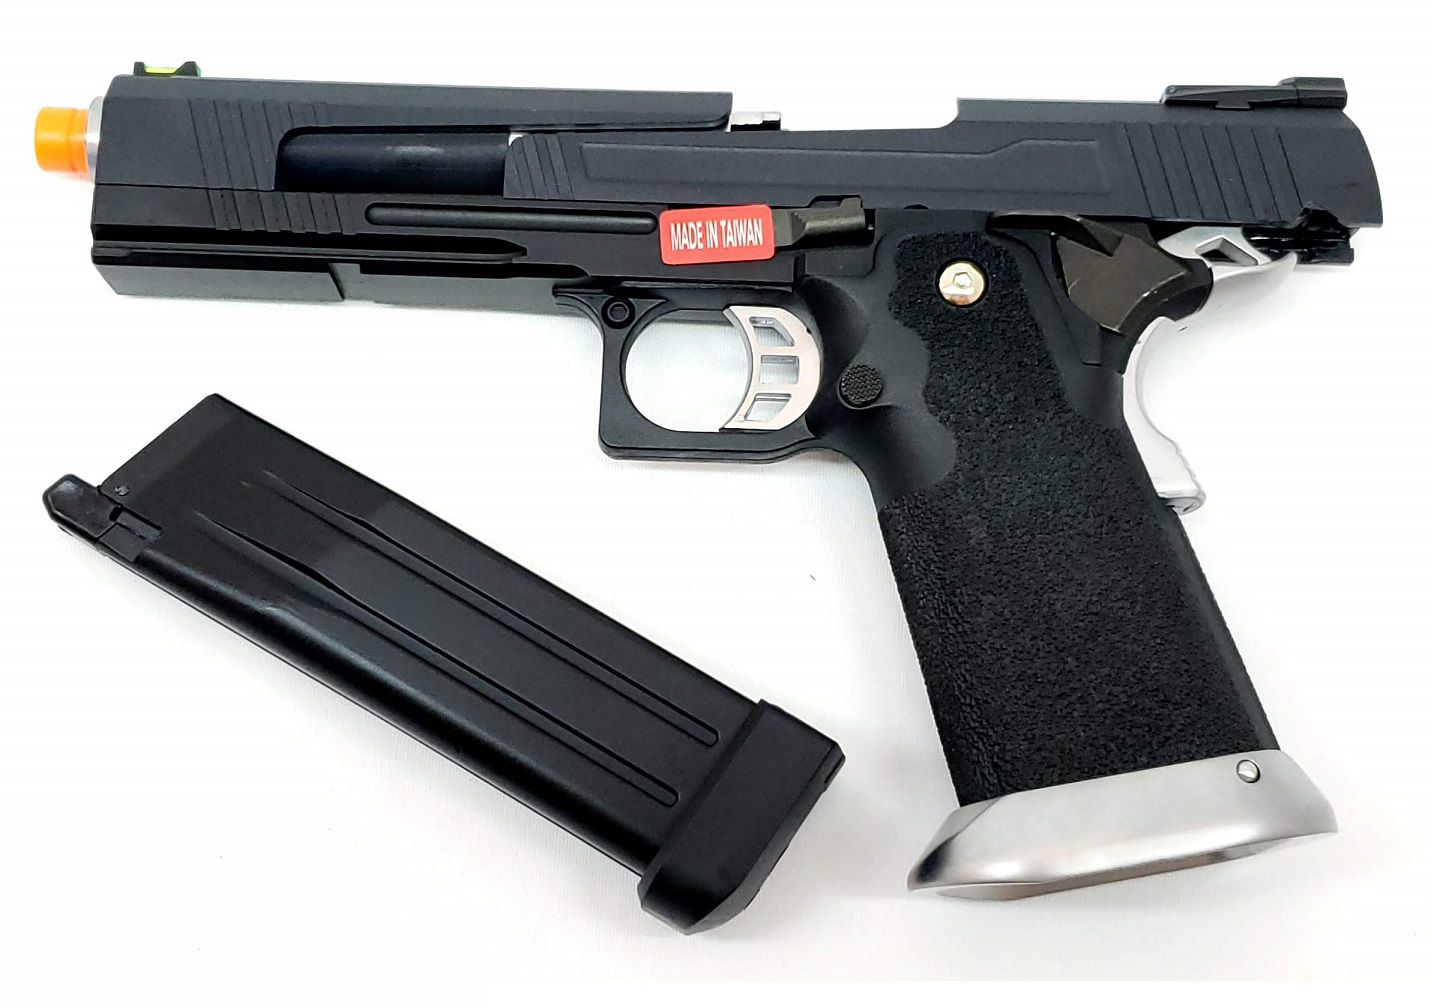 Pistola Airsoft Armorer Works Hicapa HX1002